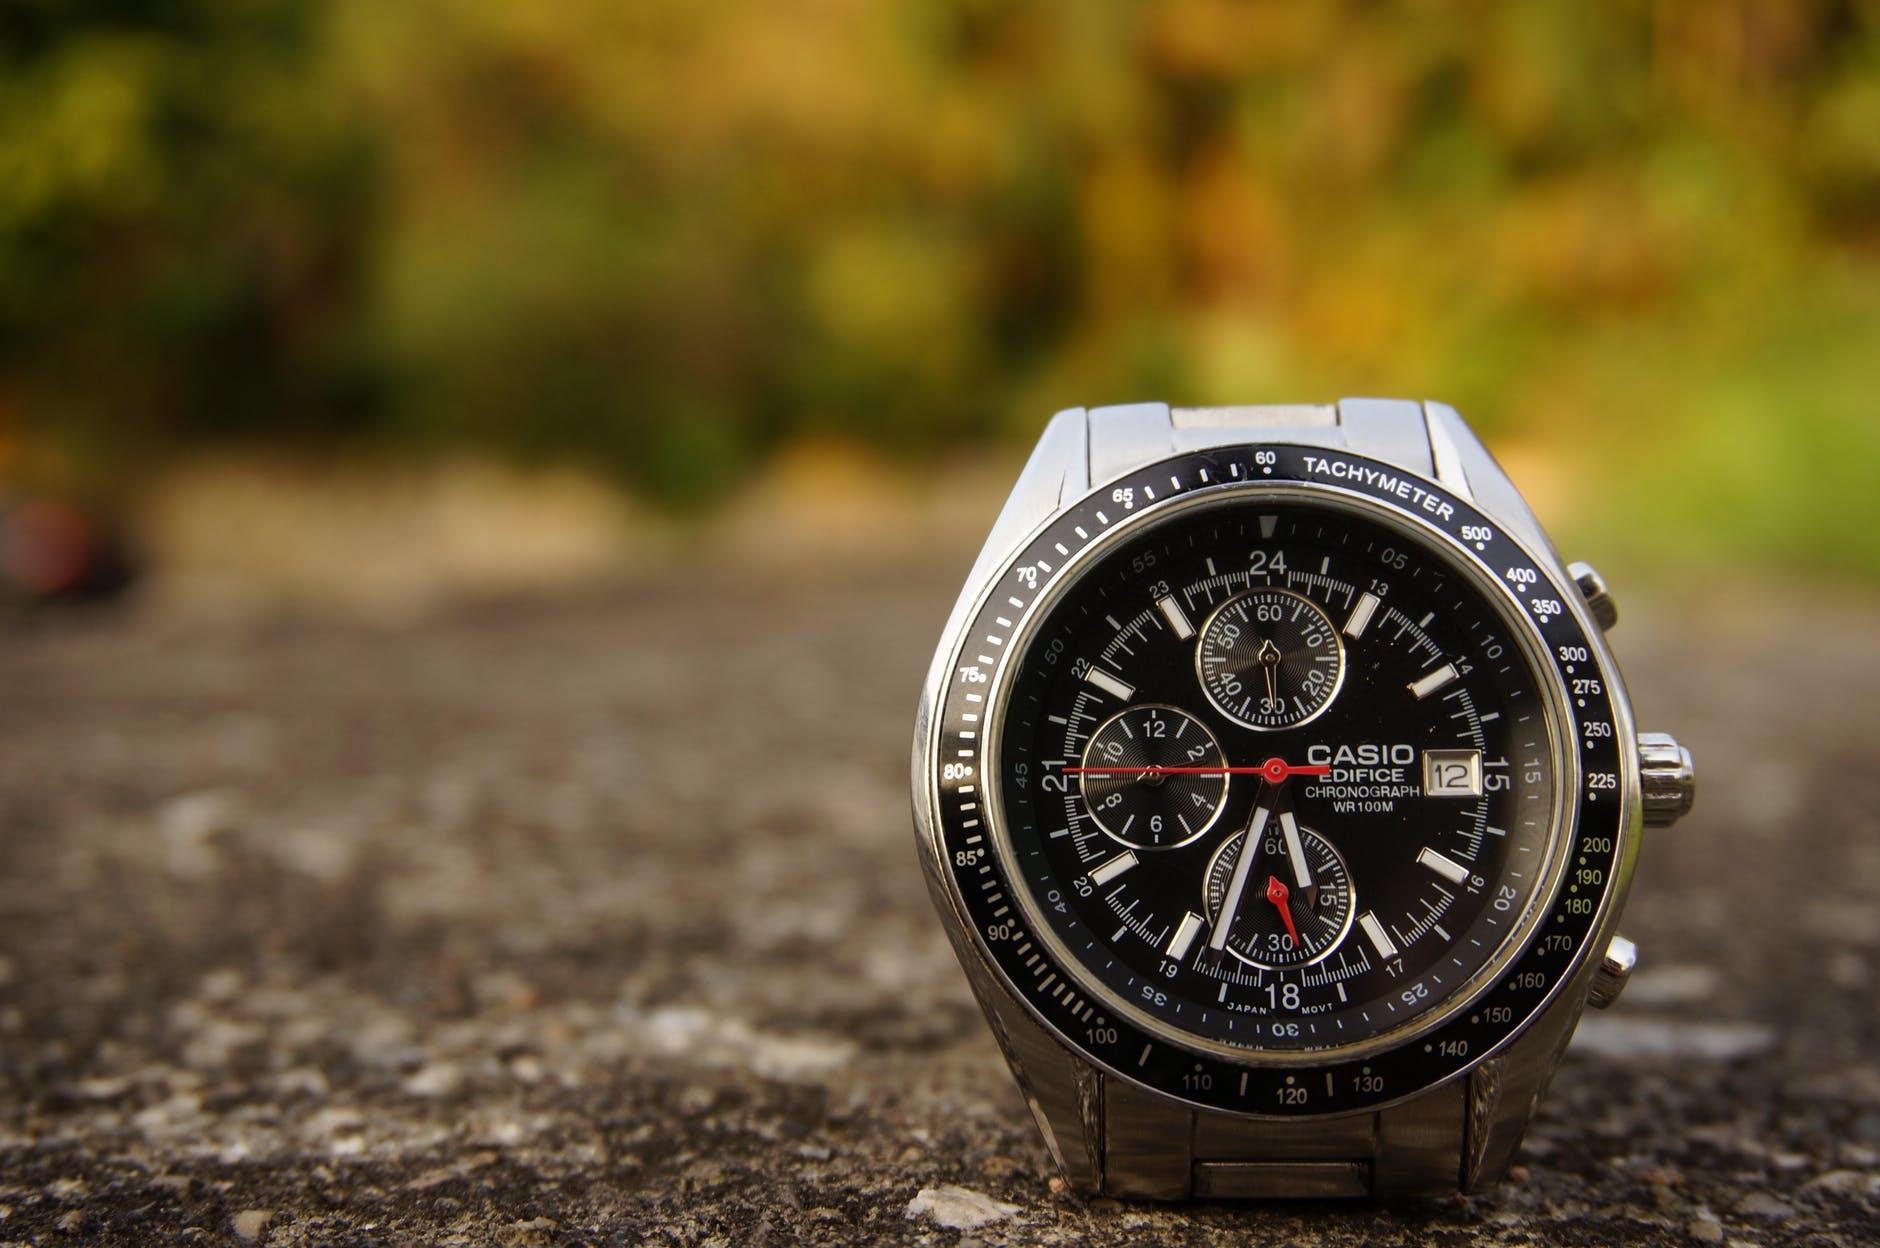 casio zegarek japoński